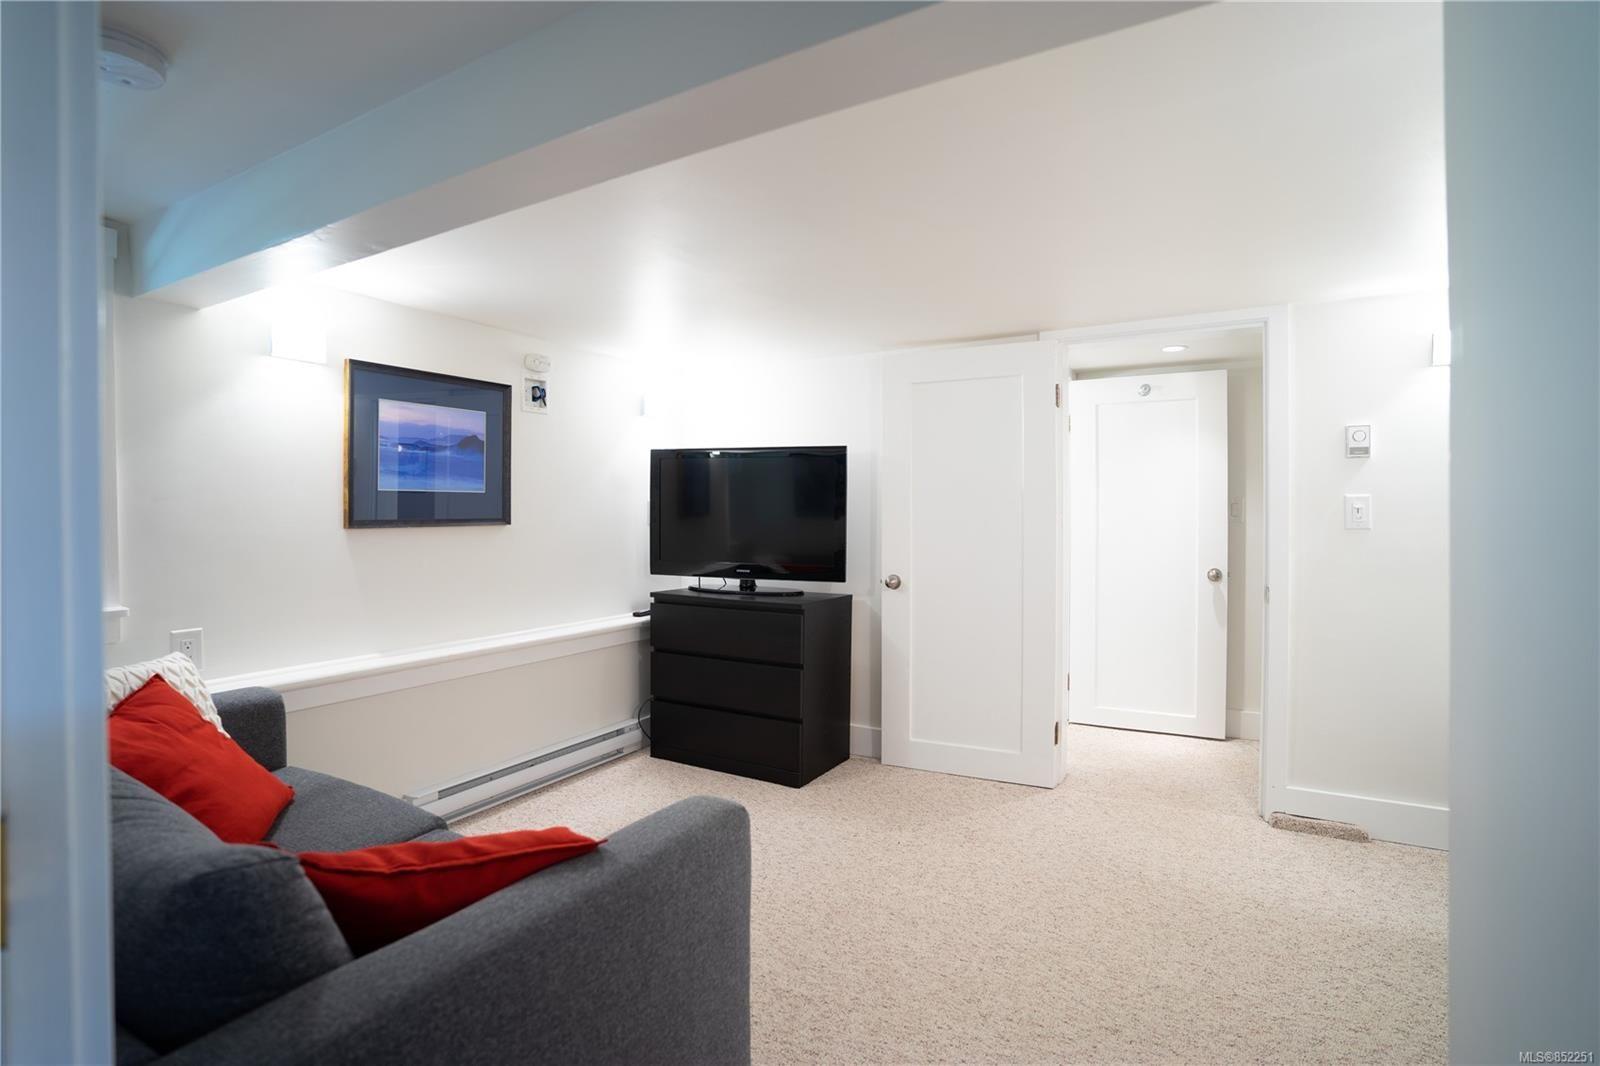 Photo 24: Photos: 2363 Pacific Ave in : OB Estevan House for sale (Oak Bay)  : MLS®# 852251